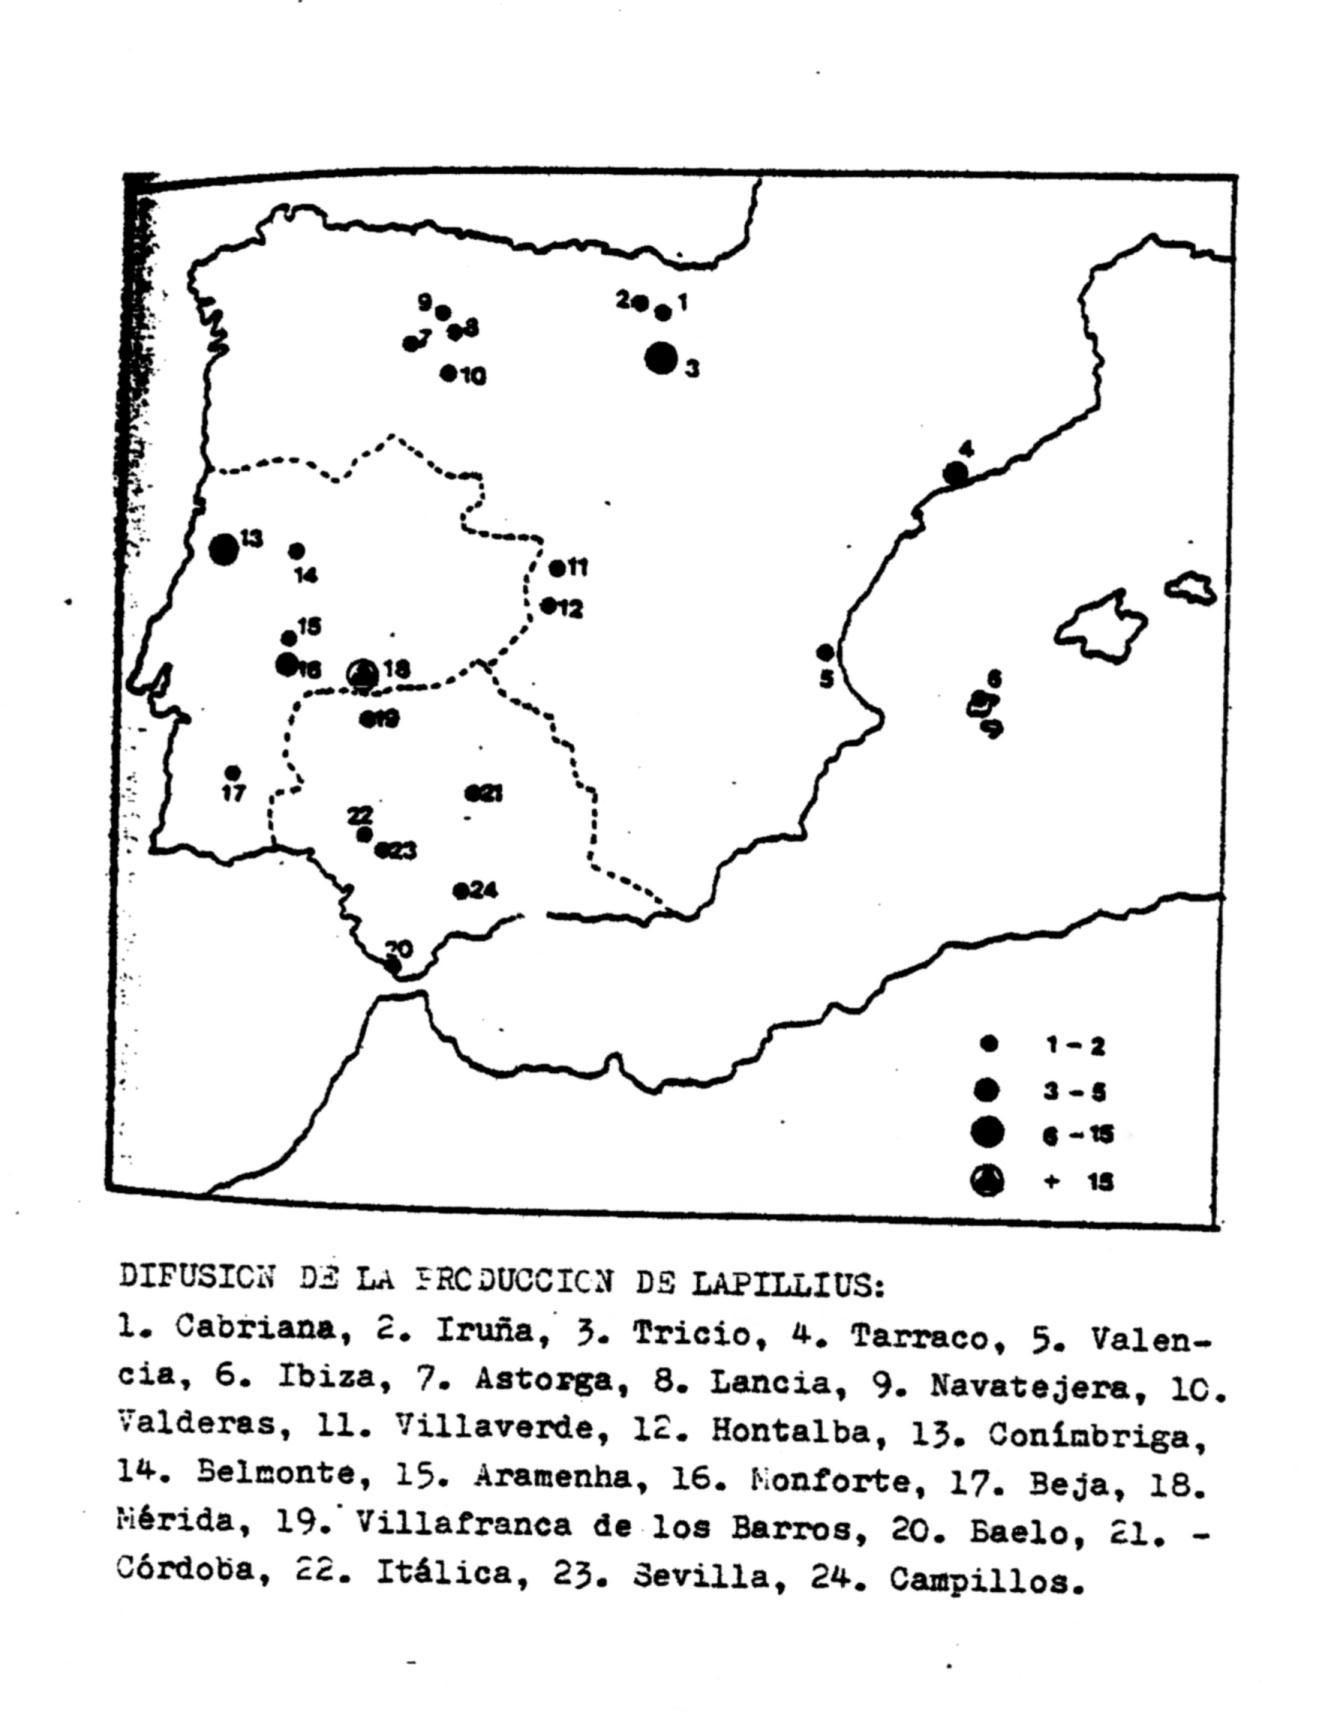 1986 Chde Trujillo # Muebles Nazaret Los Santos De Maimona